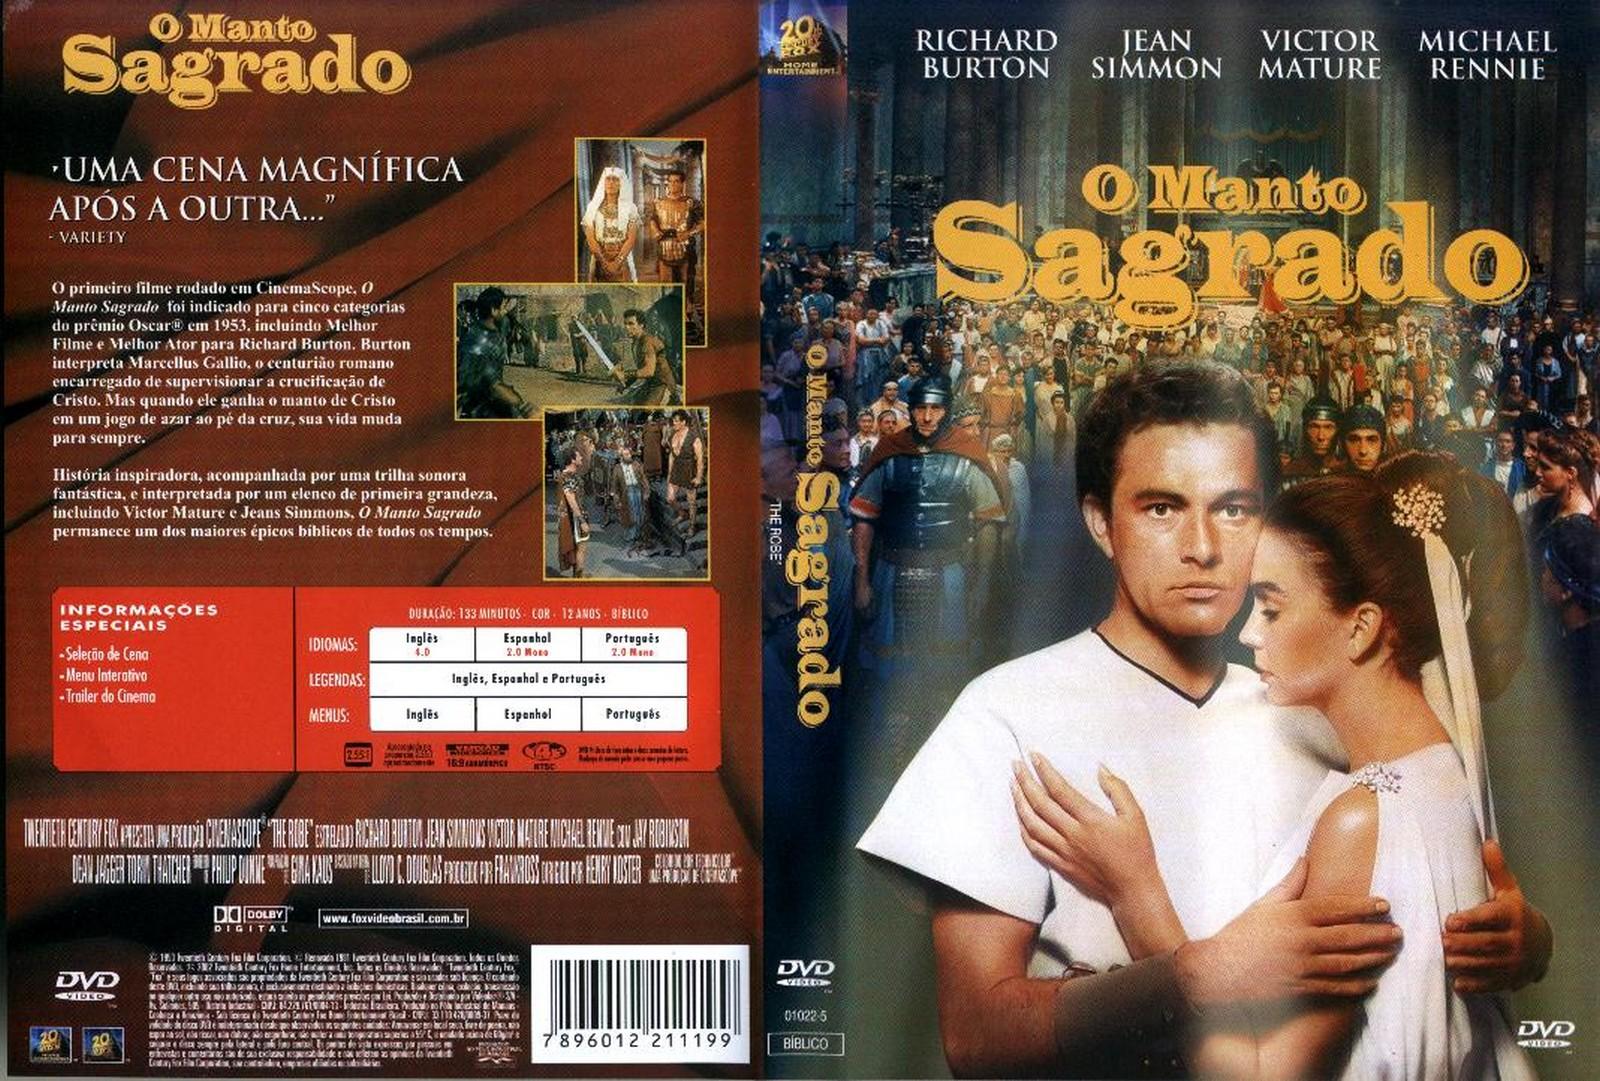 http://3.bp.blogspot.com/_UIkyBpFTkN0/TDyuxgT6S_I/AAAAAAAAANI/2L34Z0Cb4kE/s1600/O-Manto-Sagrado-outro-modelo.jpg